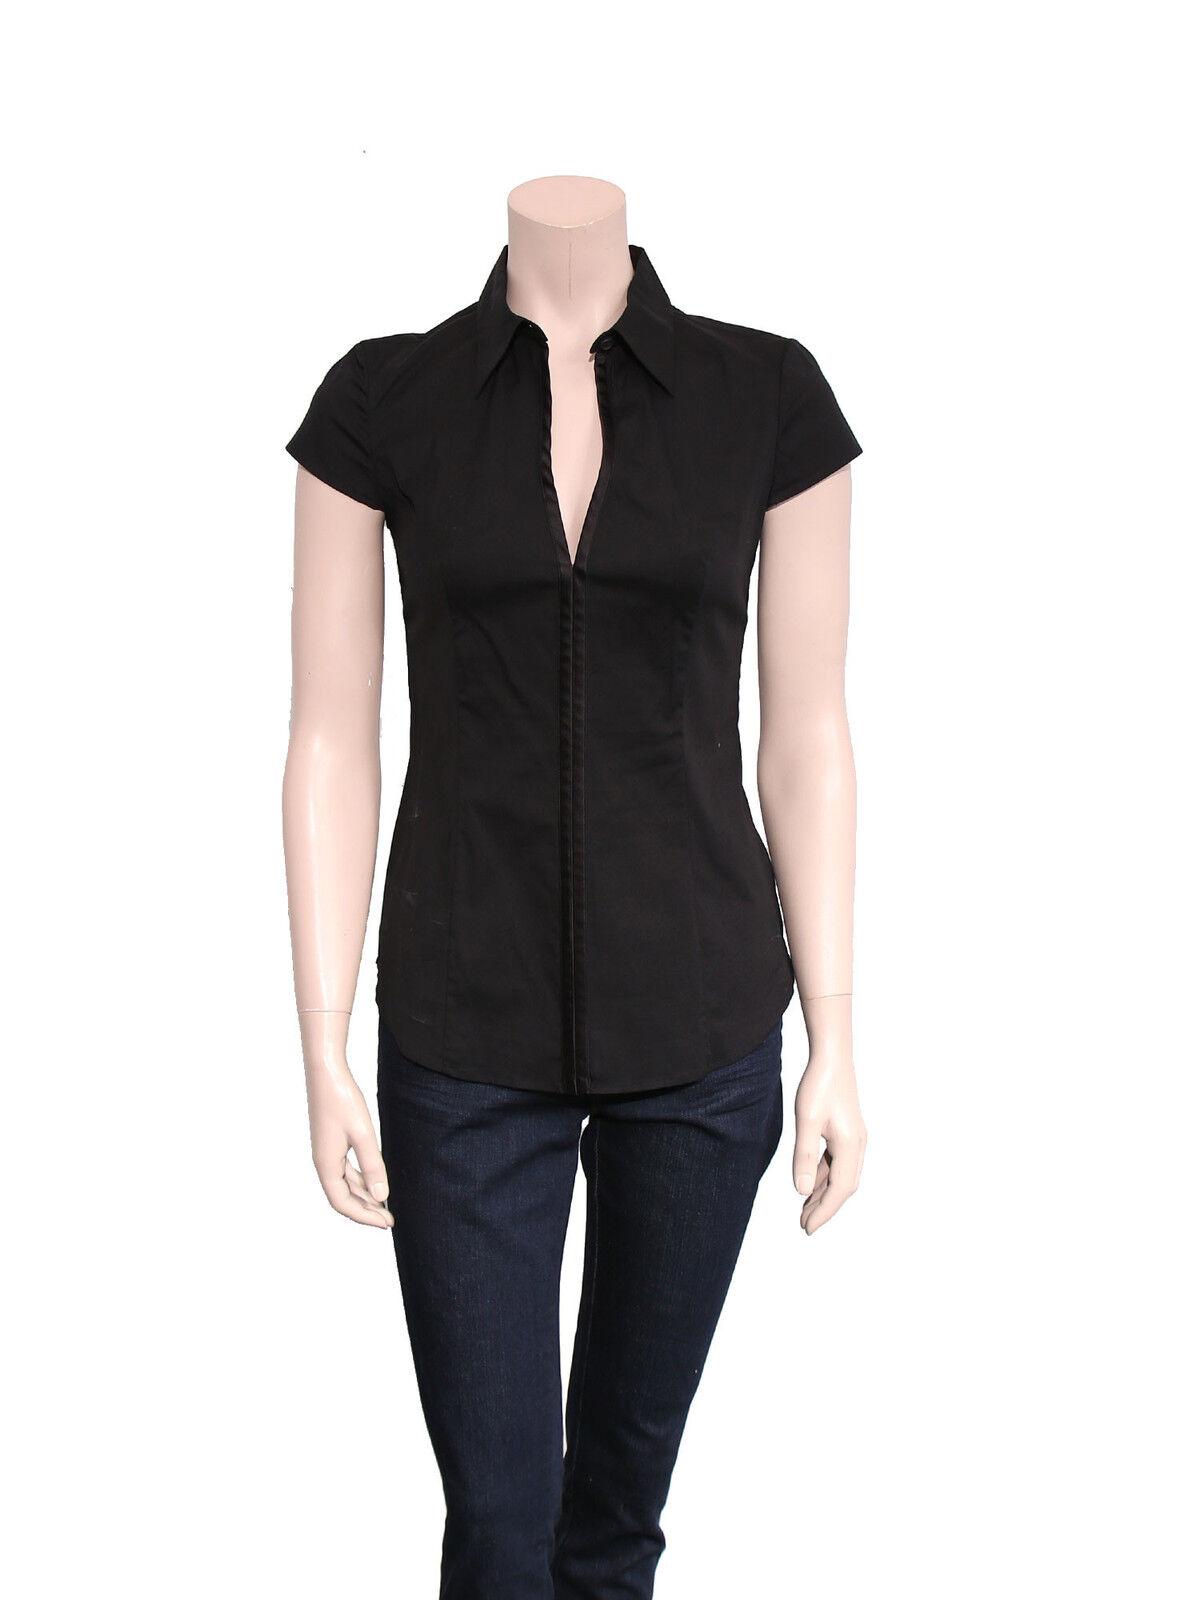 PRADA schwarz blouse Größe 38